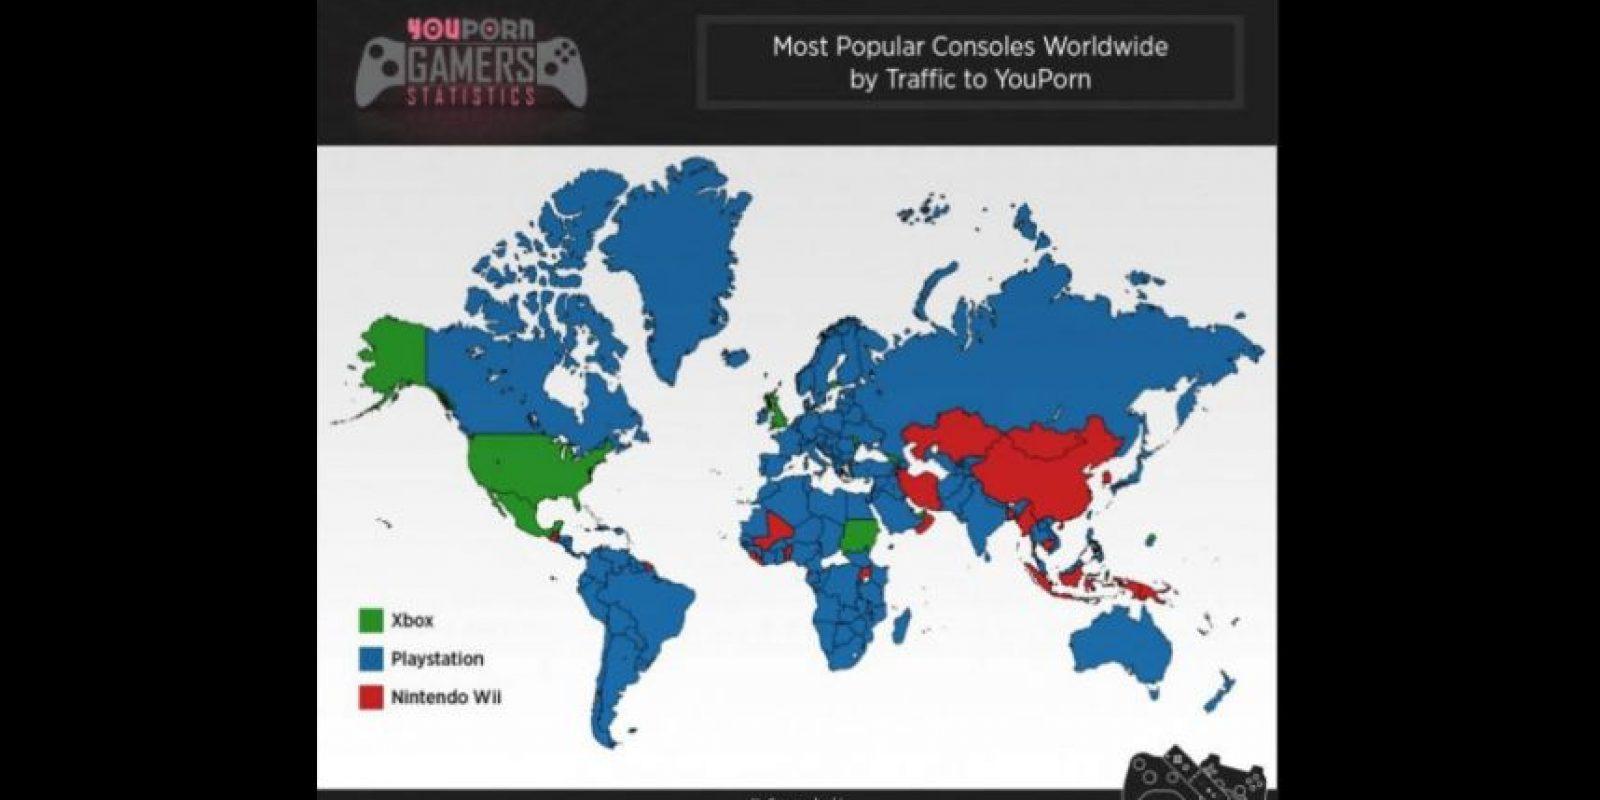 "Mapa. El mundo mira ""YouPorn"" desde PlayStation Foto:YouPorn.com/world"